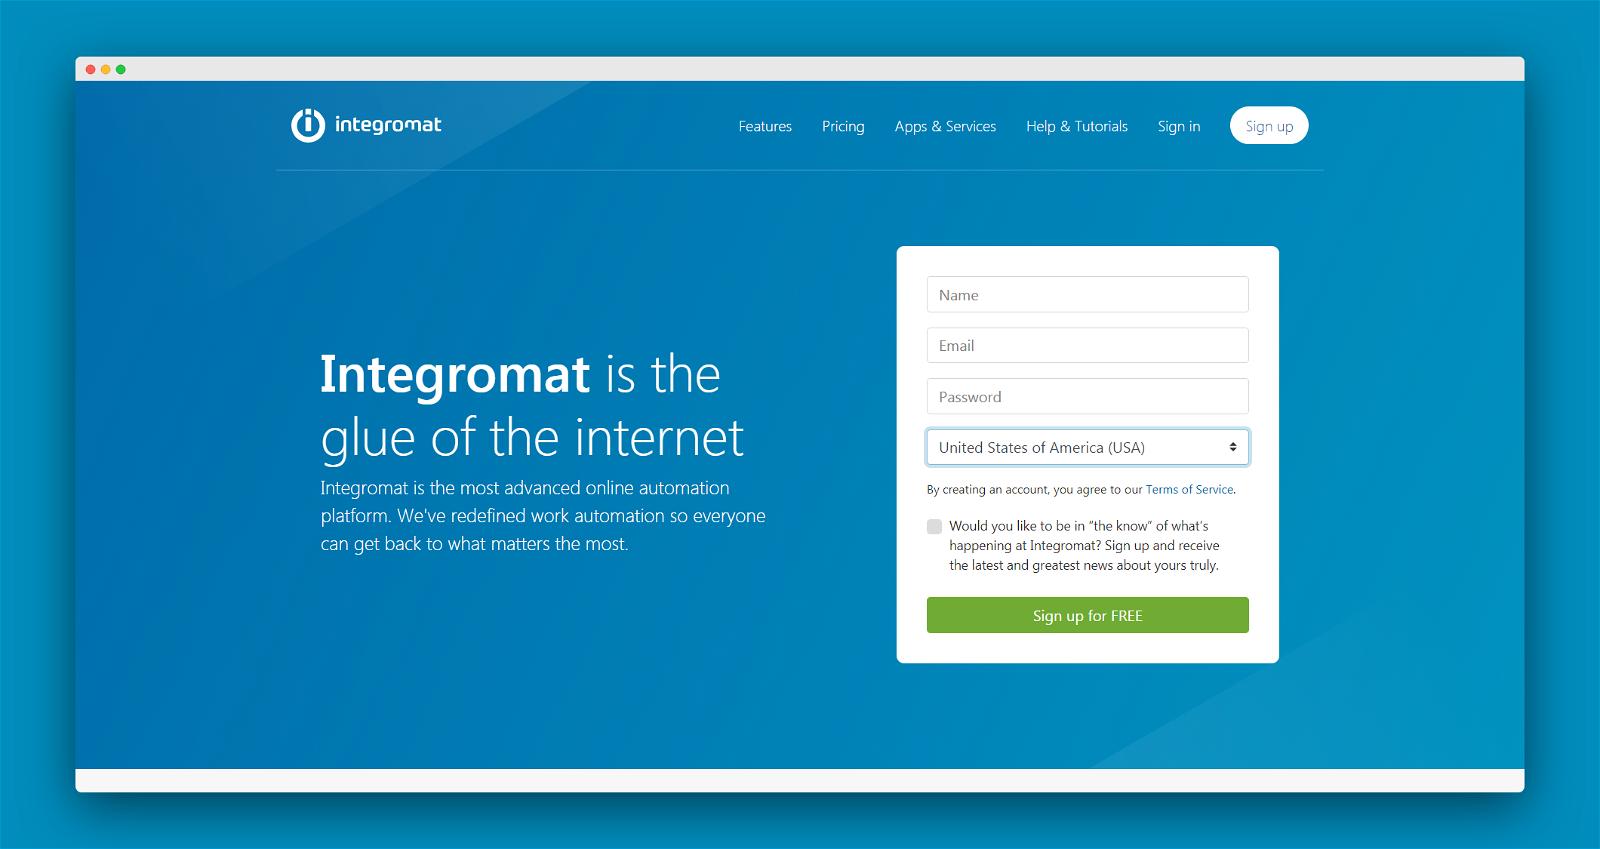 Integromat Screenshot 1